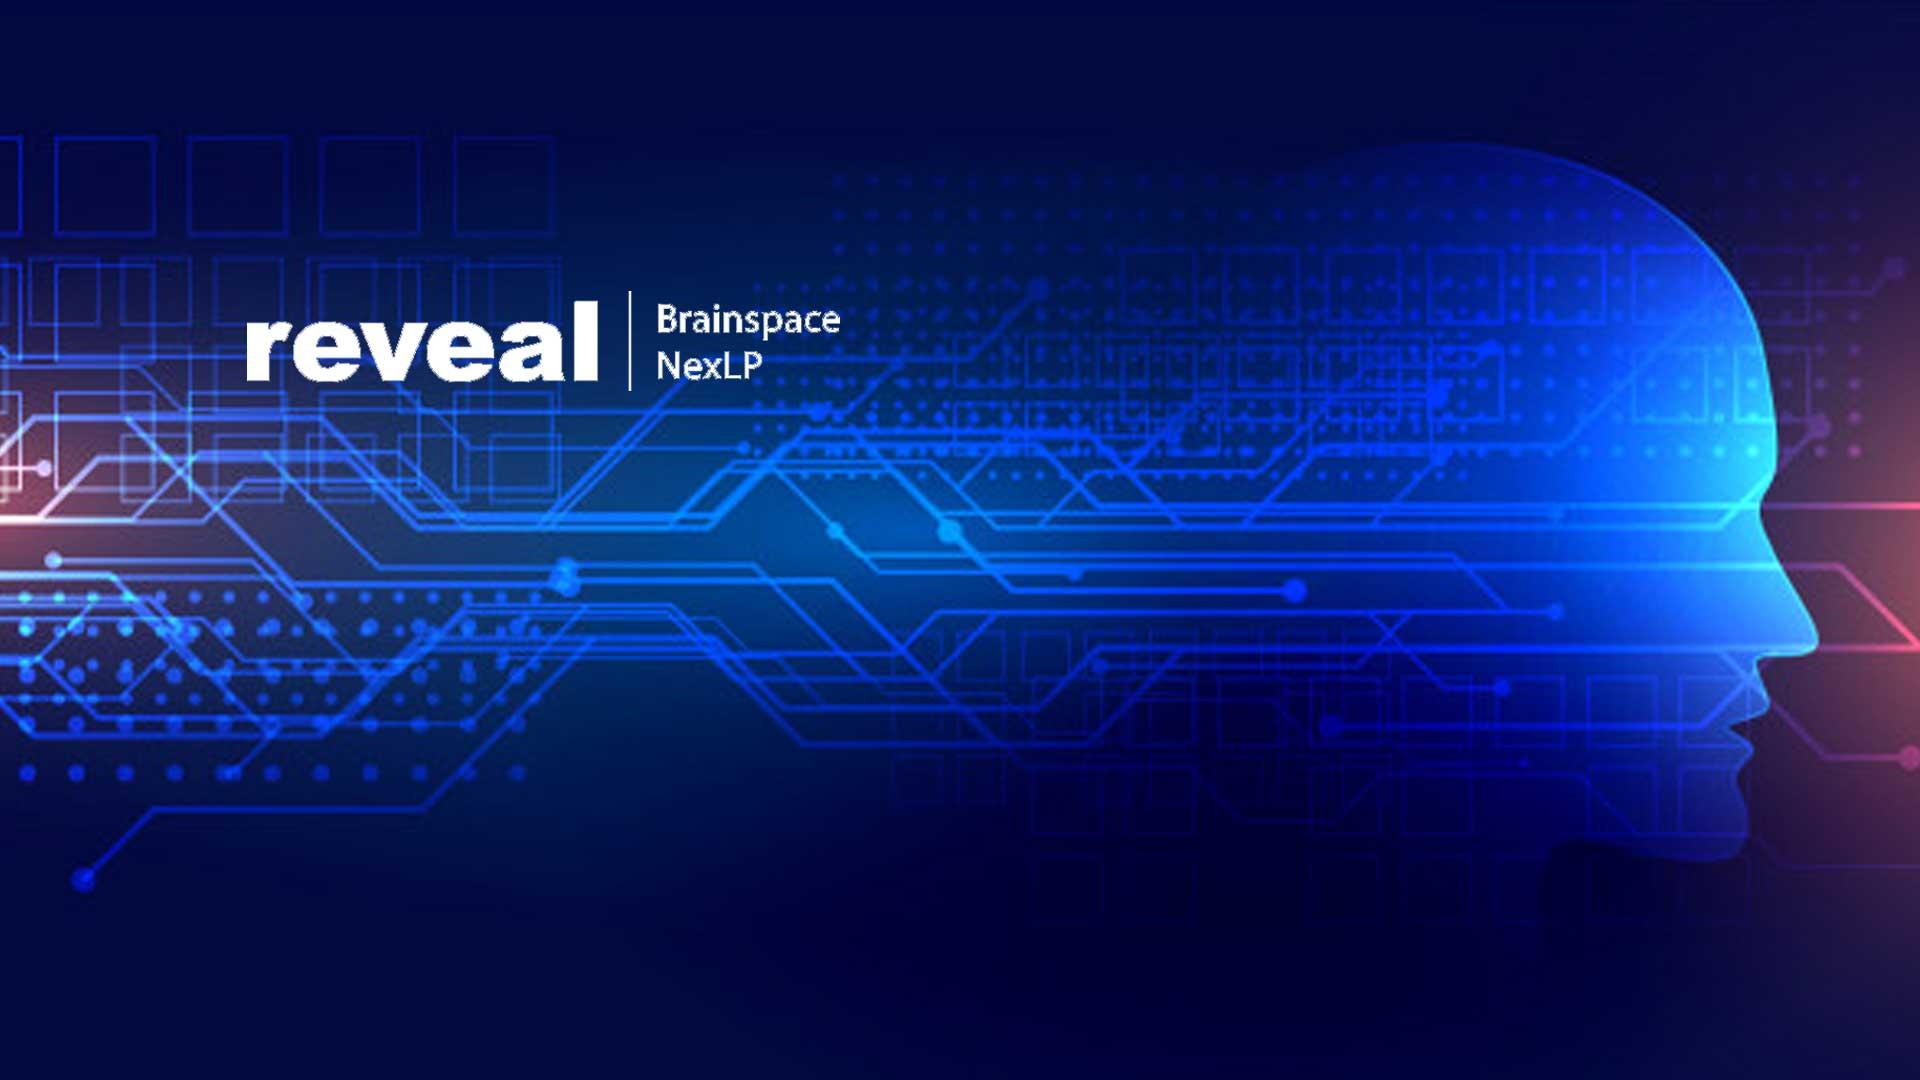 Reveal Brainspace Nexlp